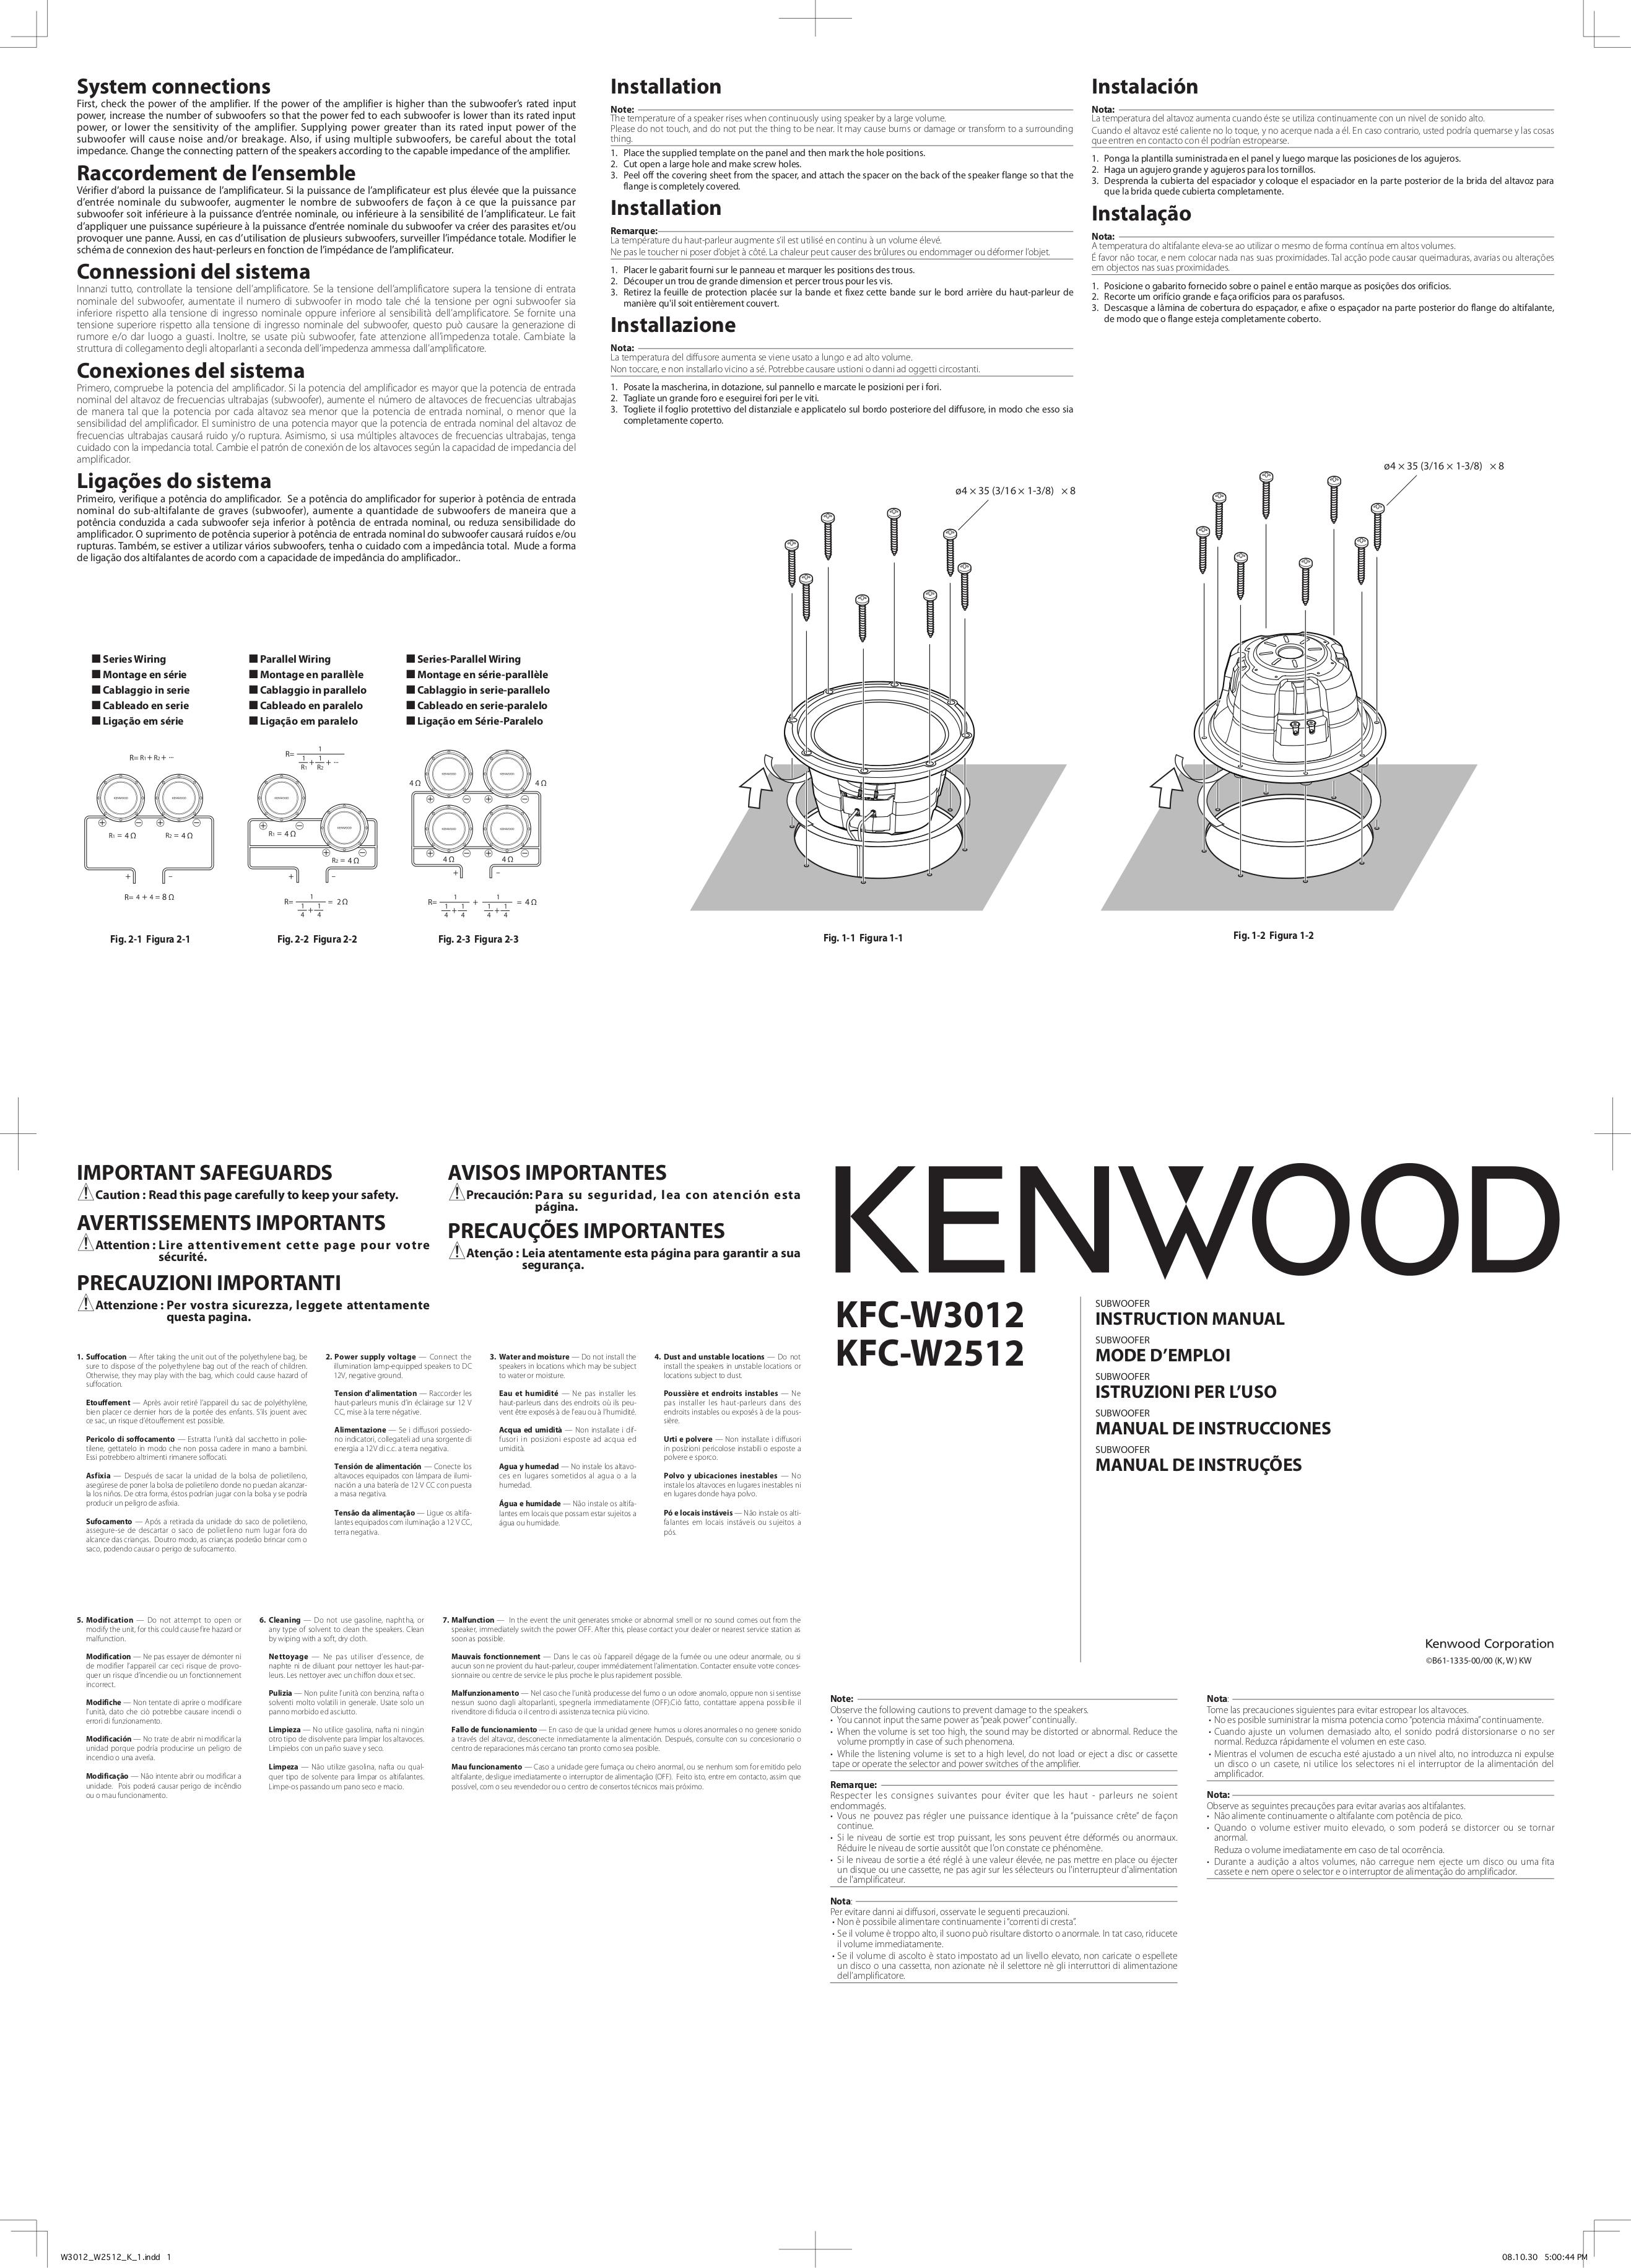 Download free pdf for kenwood kfc w3012 subwoofer manual pdf for kenwood subwoofer kfc w3012 manual sciox Gallery